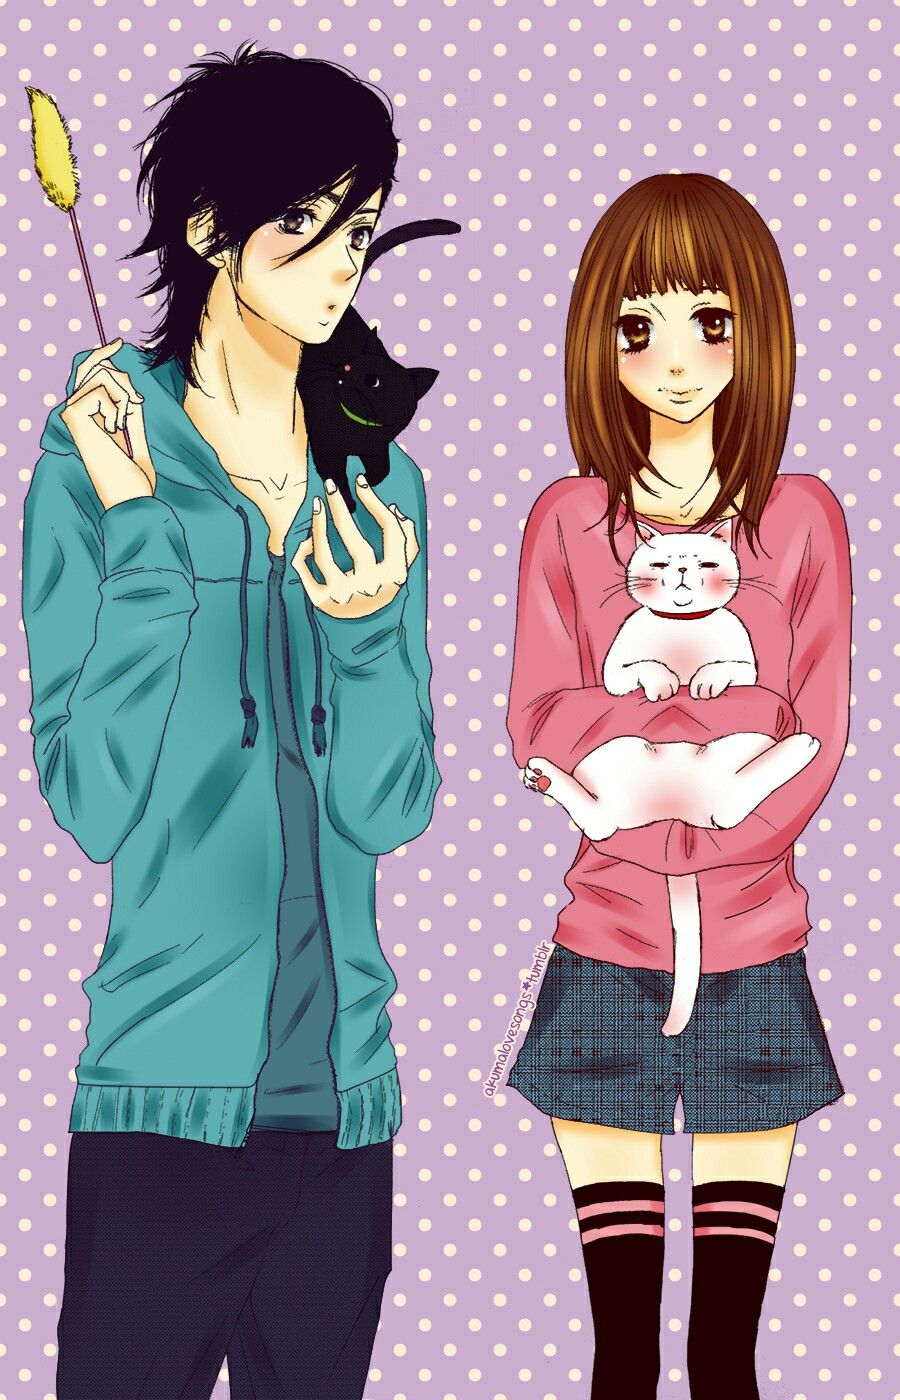 Épinglé par La britani sur Sukitte iinayo ♡ Couple manga